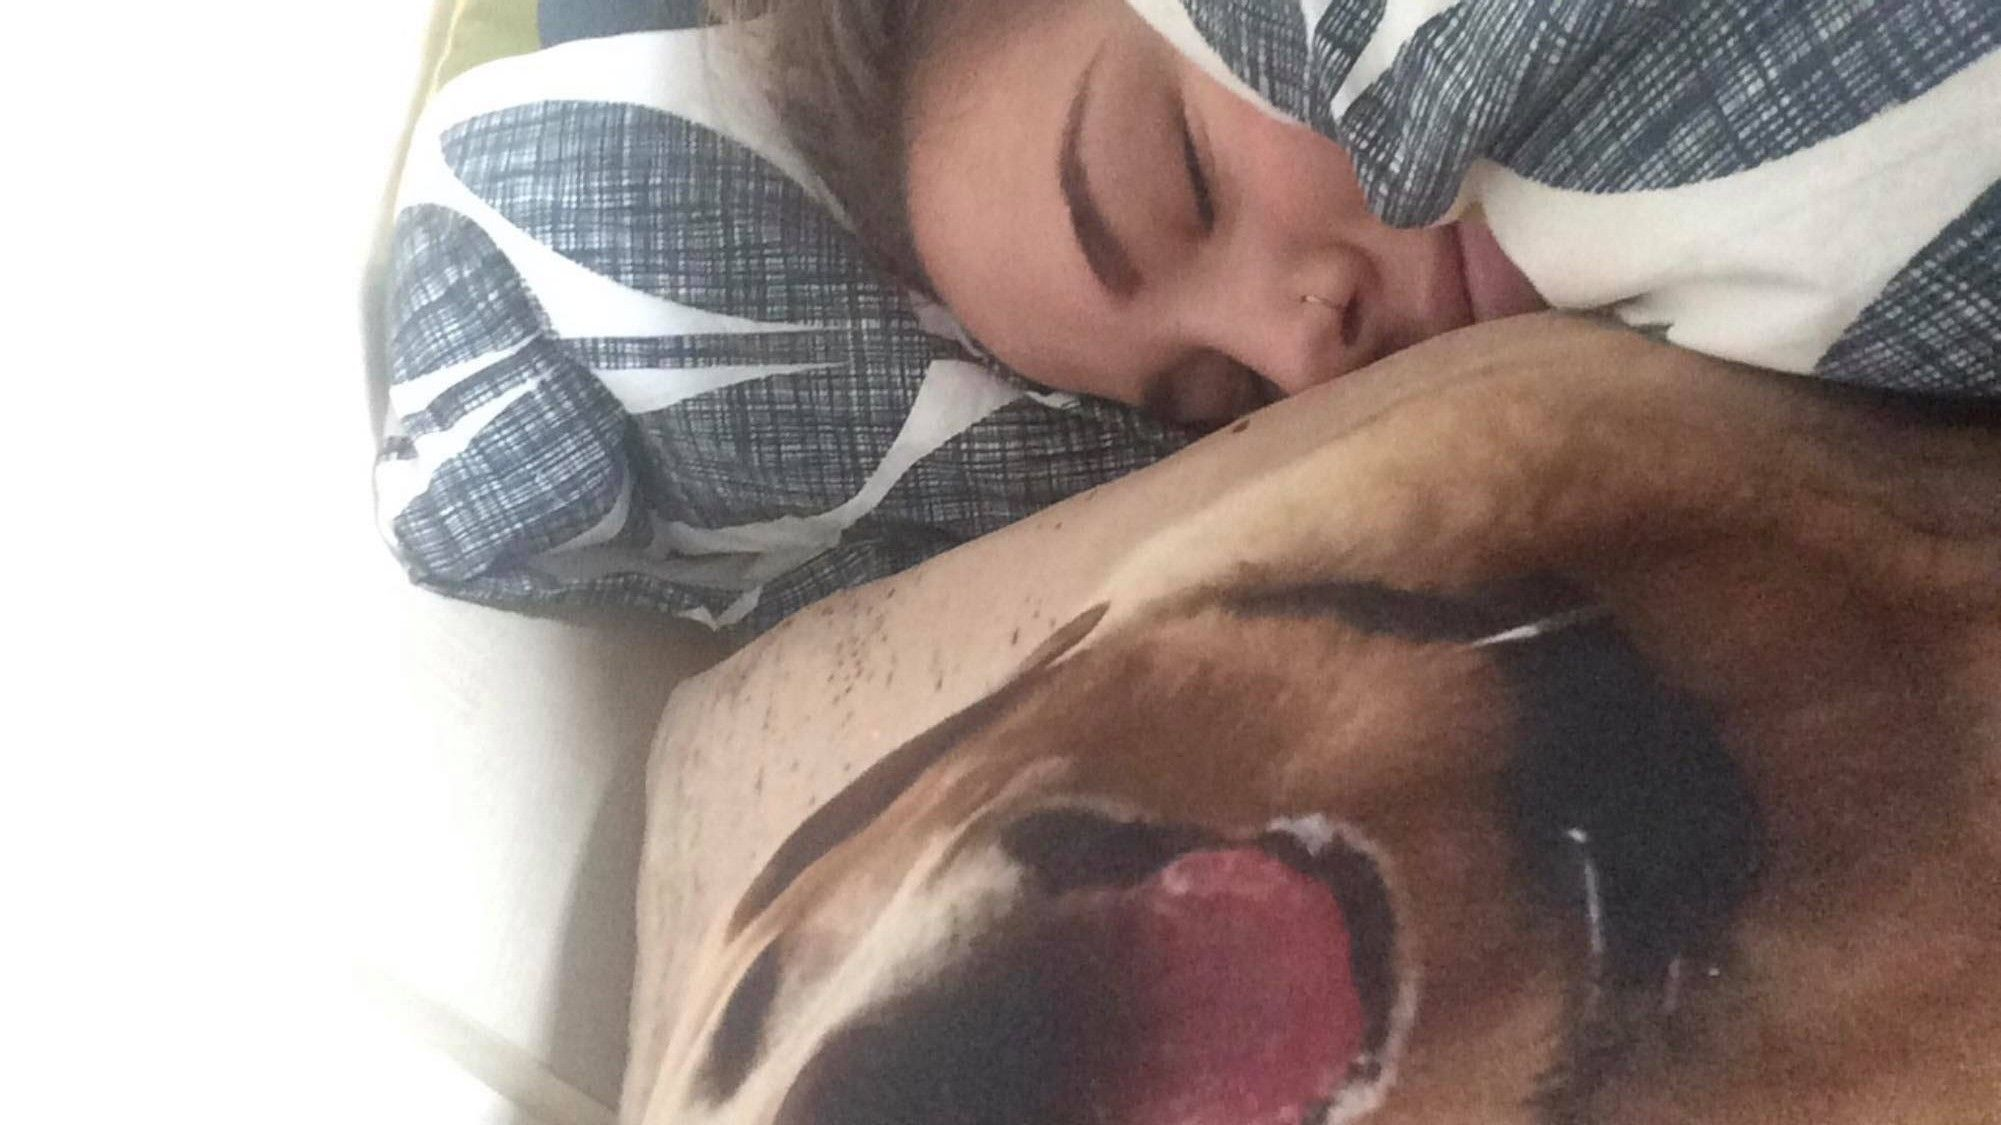 Image may contain: Blanket, Home Decor, Person, Human, Skin, Asleep, Sleeping, Cushion, Pillow